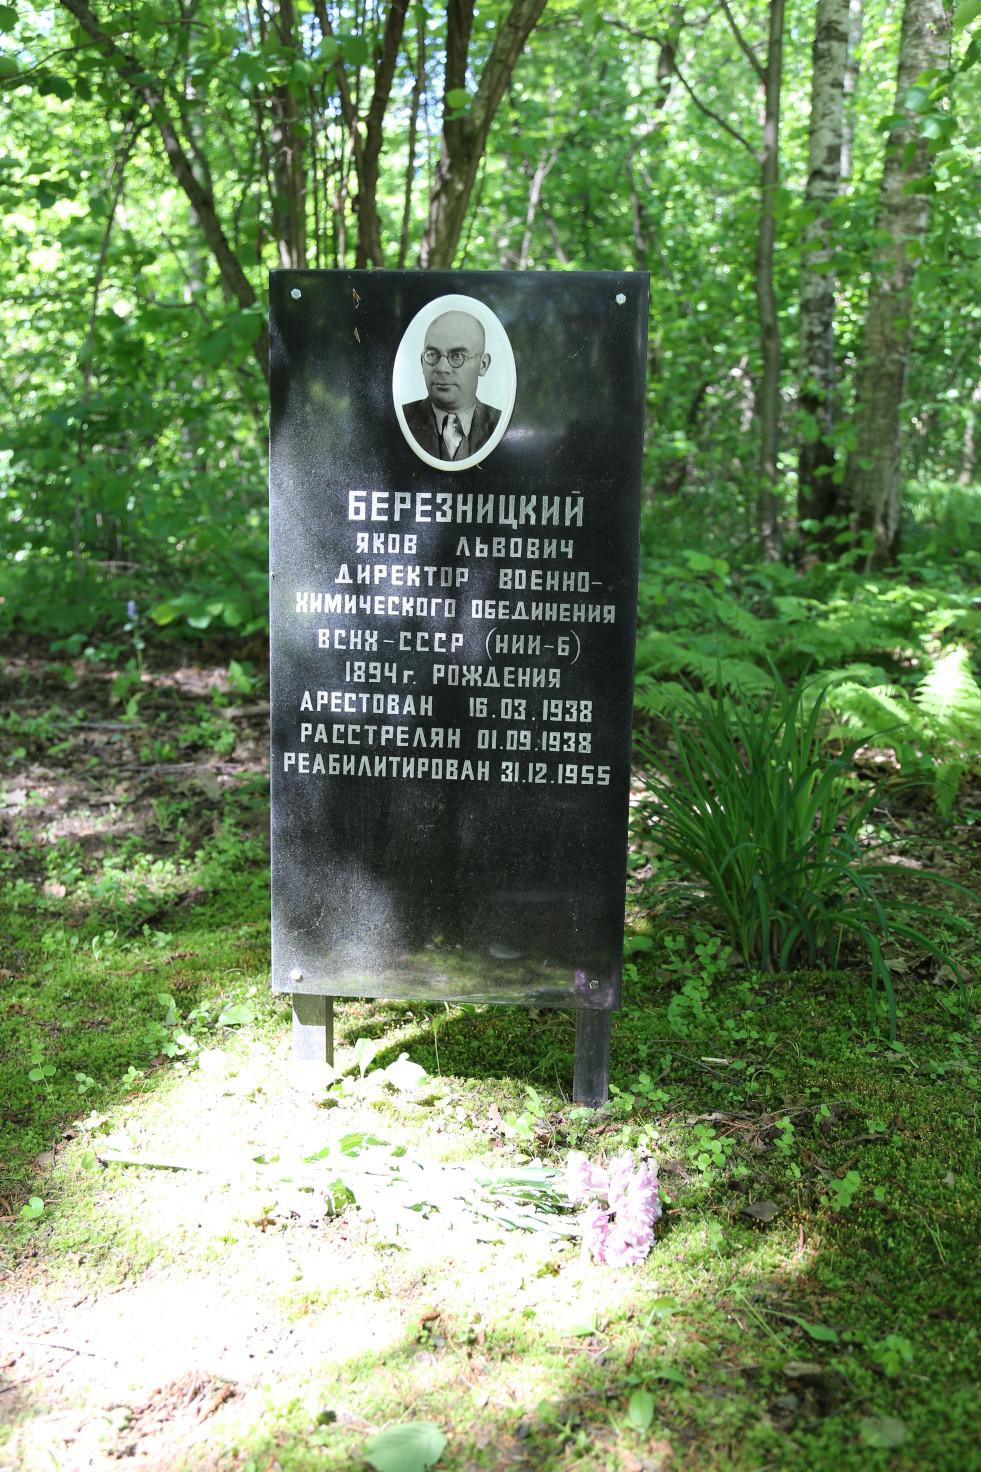 Символическое надгробие Я.Л. Березницкого. Фото 07.06.2018